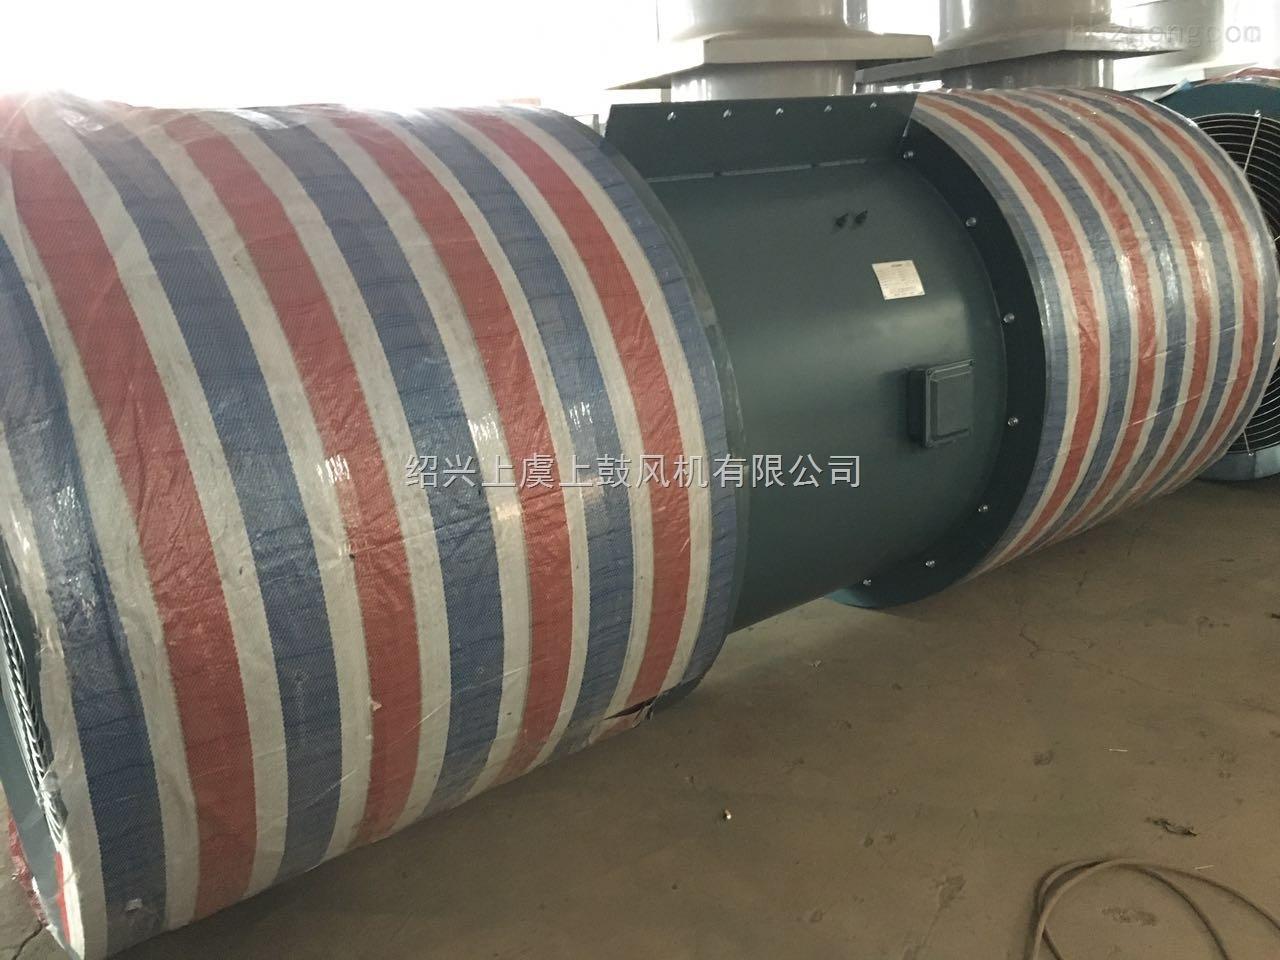 SDS(R)-10-4P-8-27°-18.5kw雙向隧道射流風機含3C消防認證